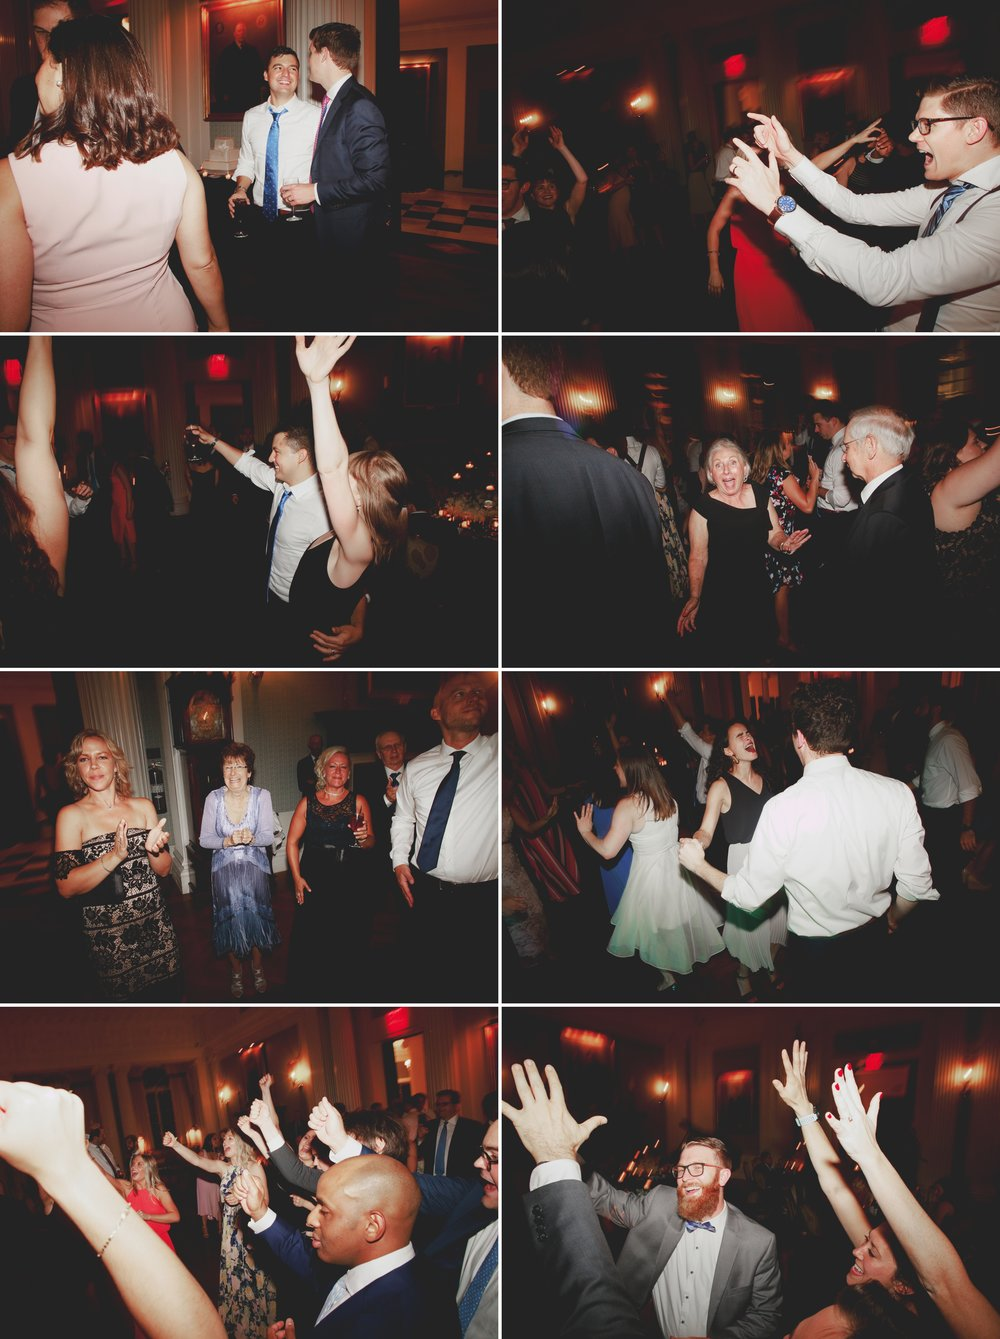 amanda_vanvels_new_york_lgbtq_gay_wedding_108.jpg